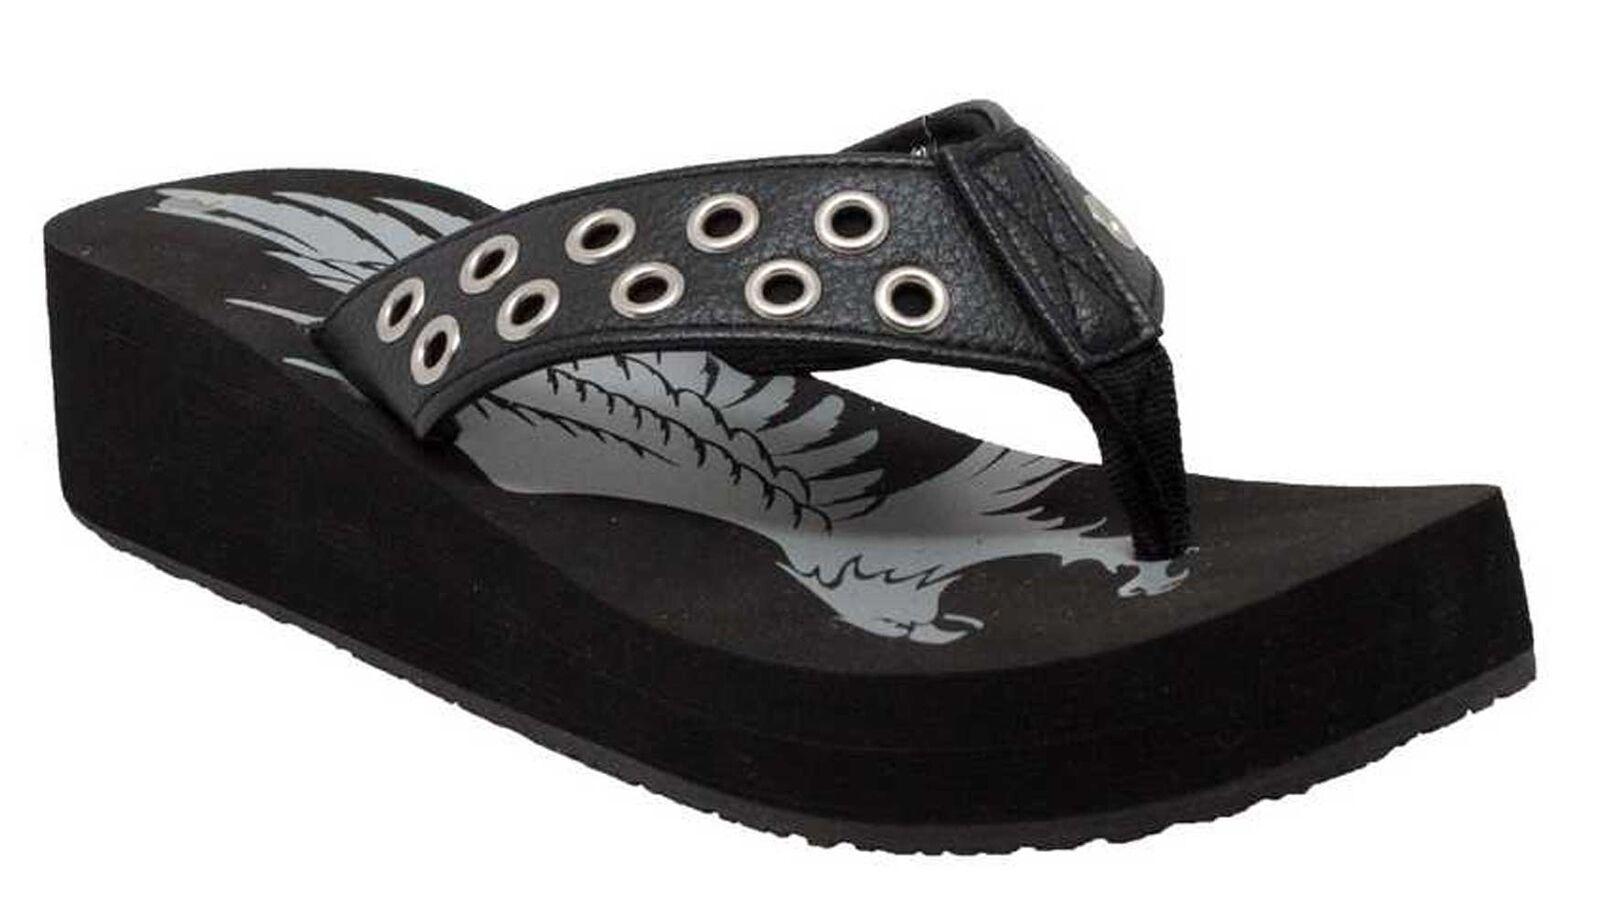 AdTec Women's Wedge Ring Thong Flip Flop Sandal, Small Wedge Women's Heel, Black. 8591 c13e12